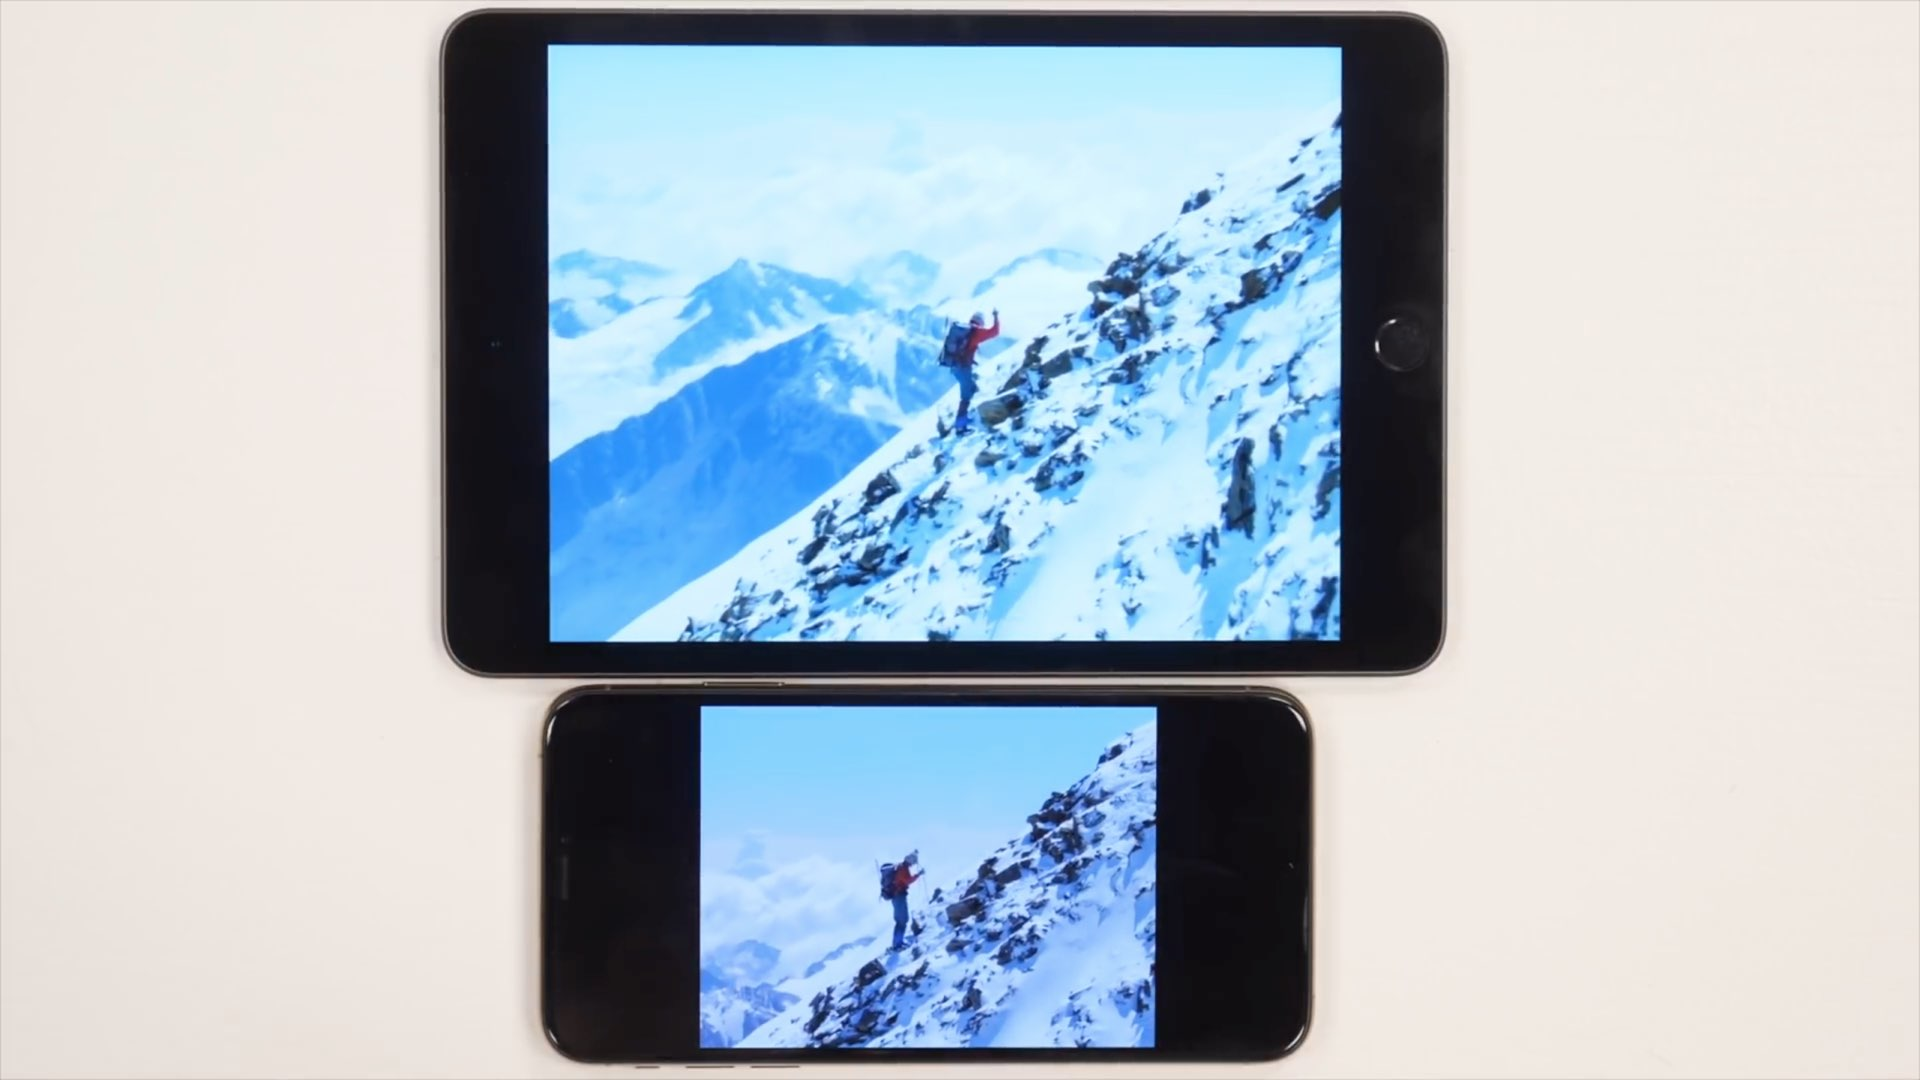 Hands-on video: iPad mini vs  iPhone XS Max — how the screen